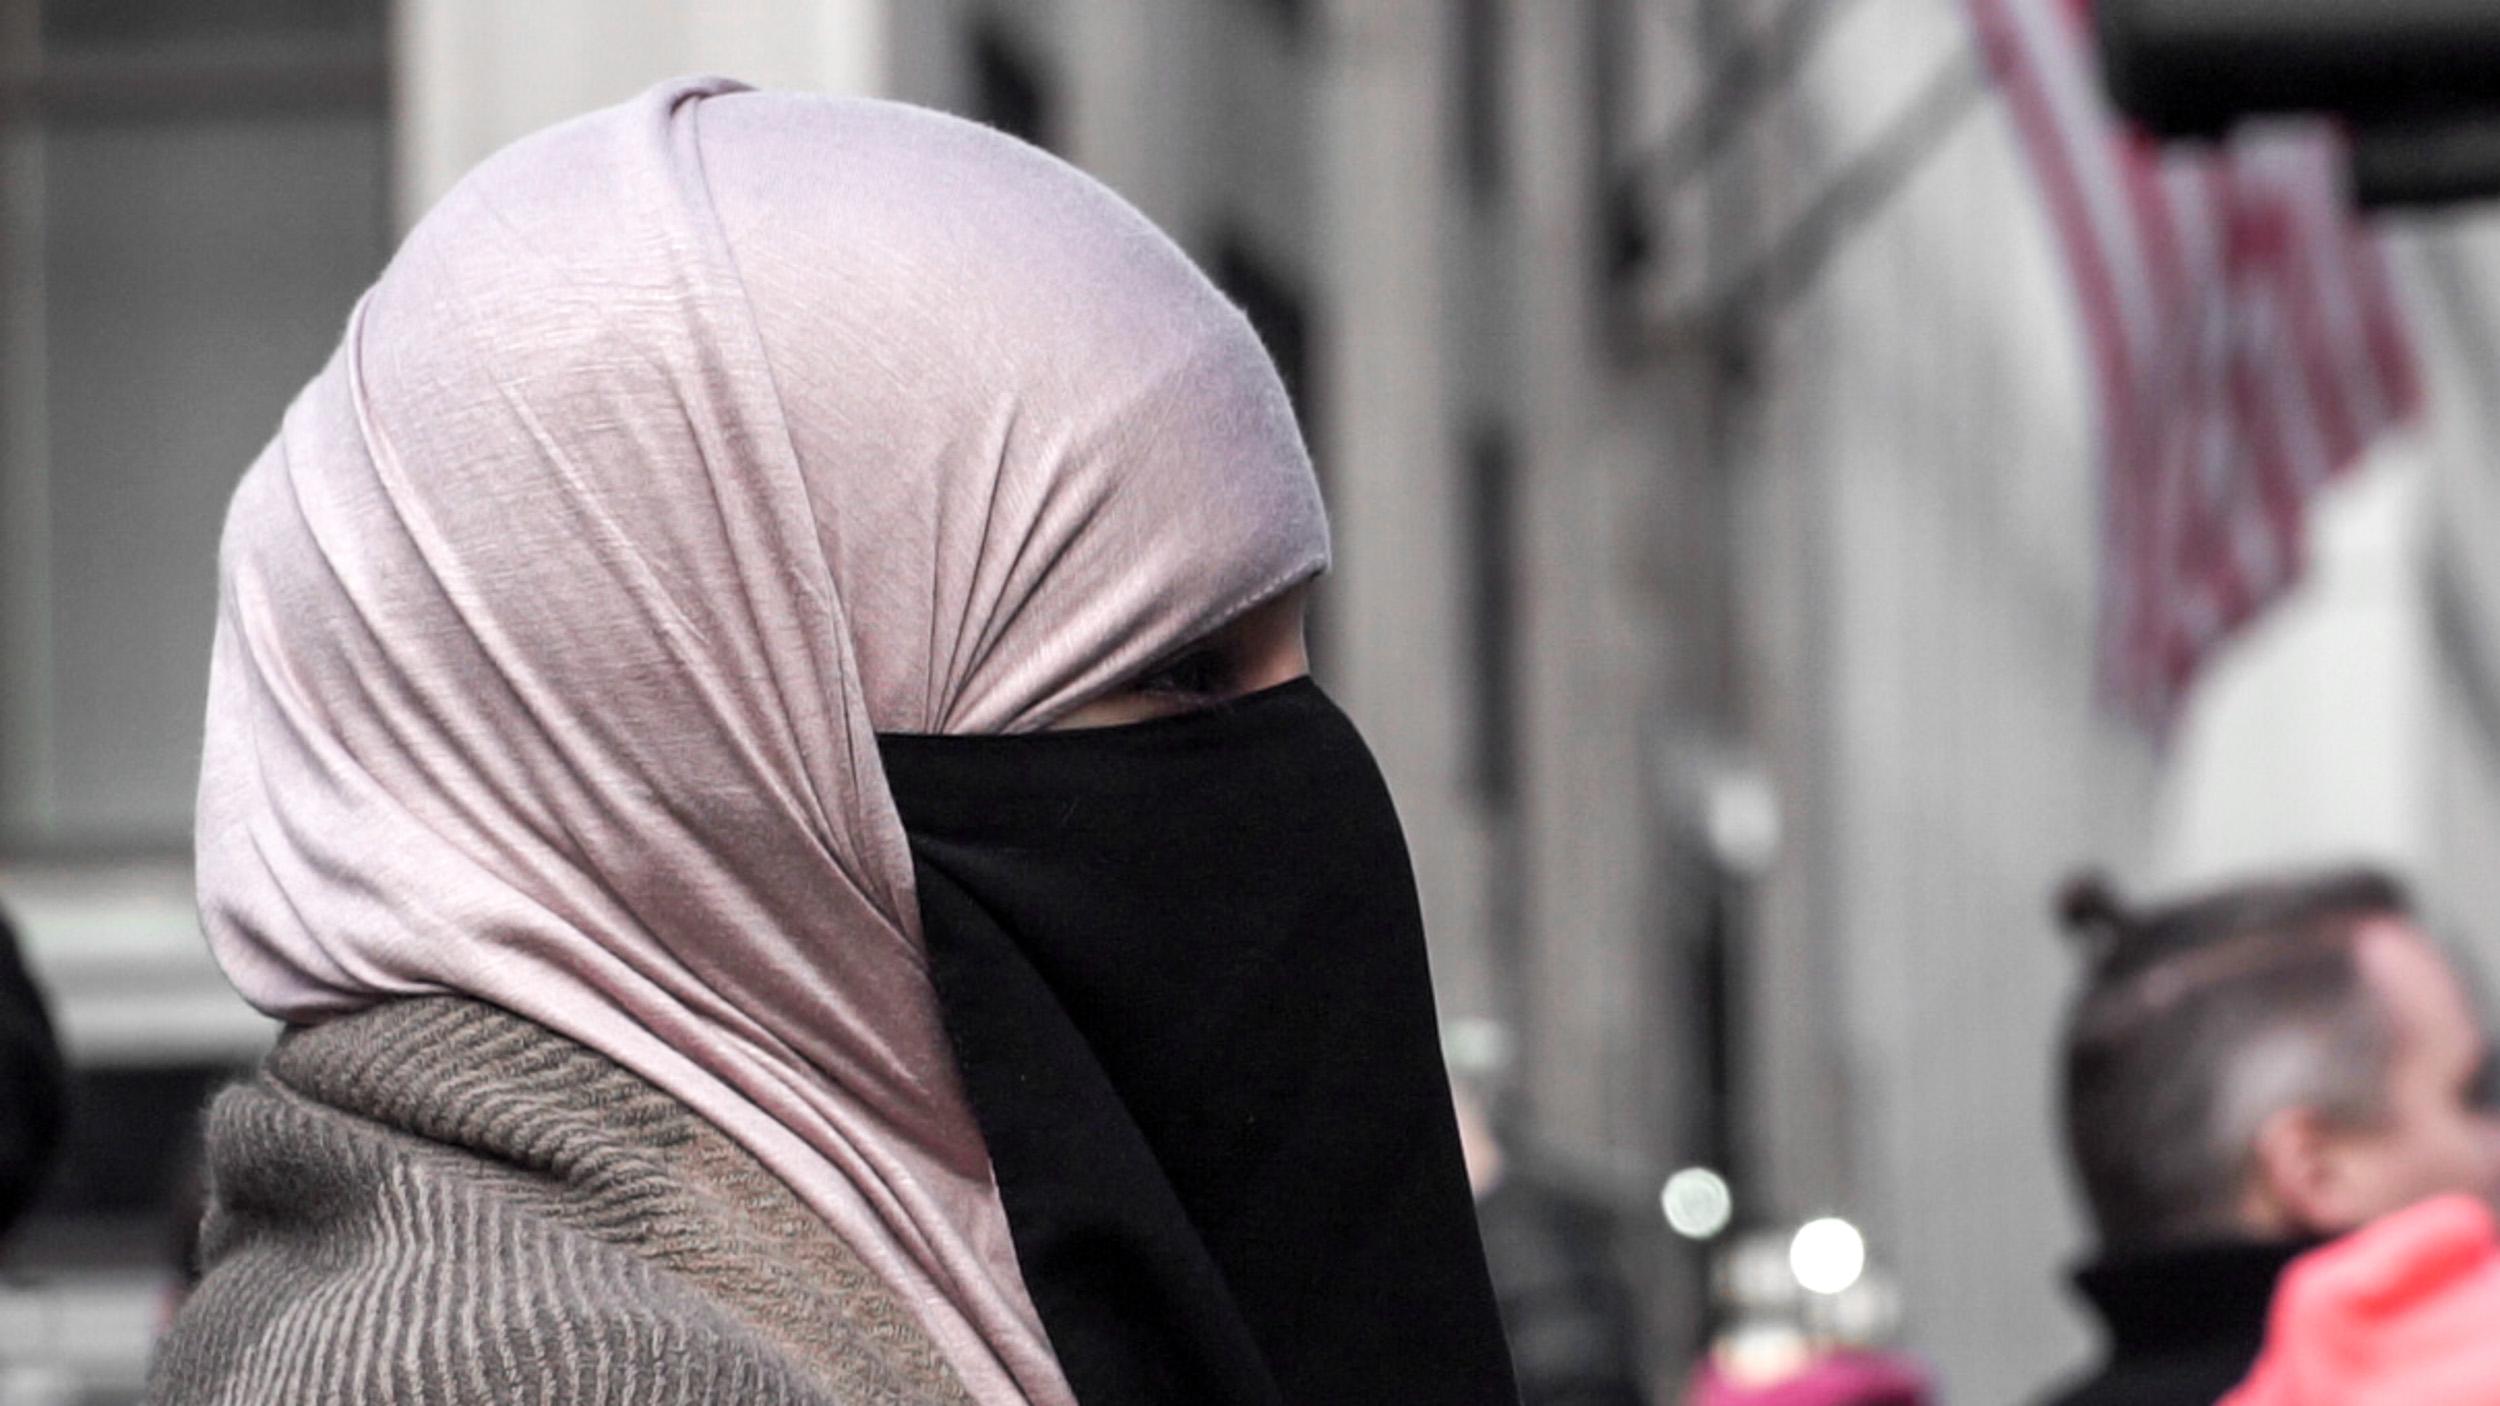 Muslim Woman in New York CIty, Jan 2017. Photo: Nicholas Whelan.